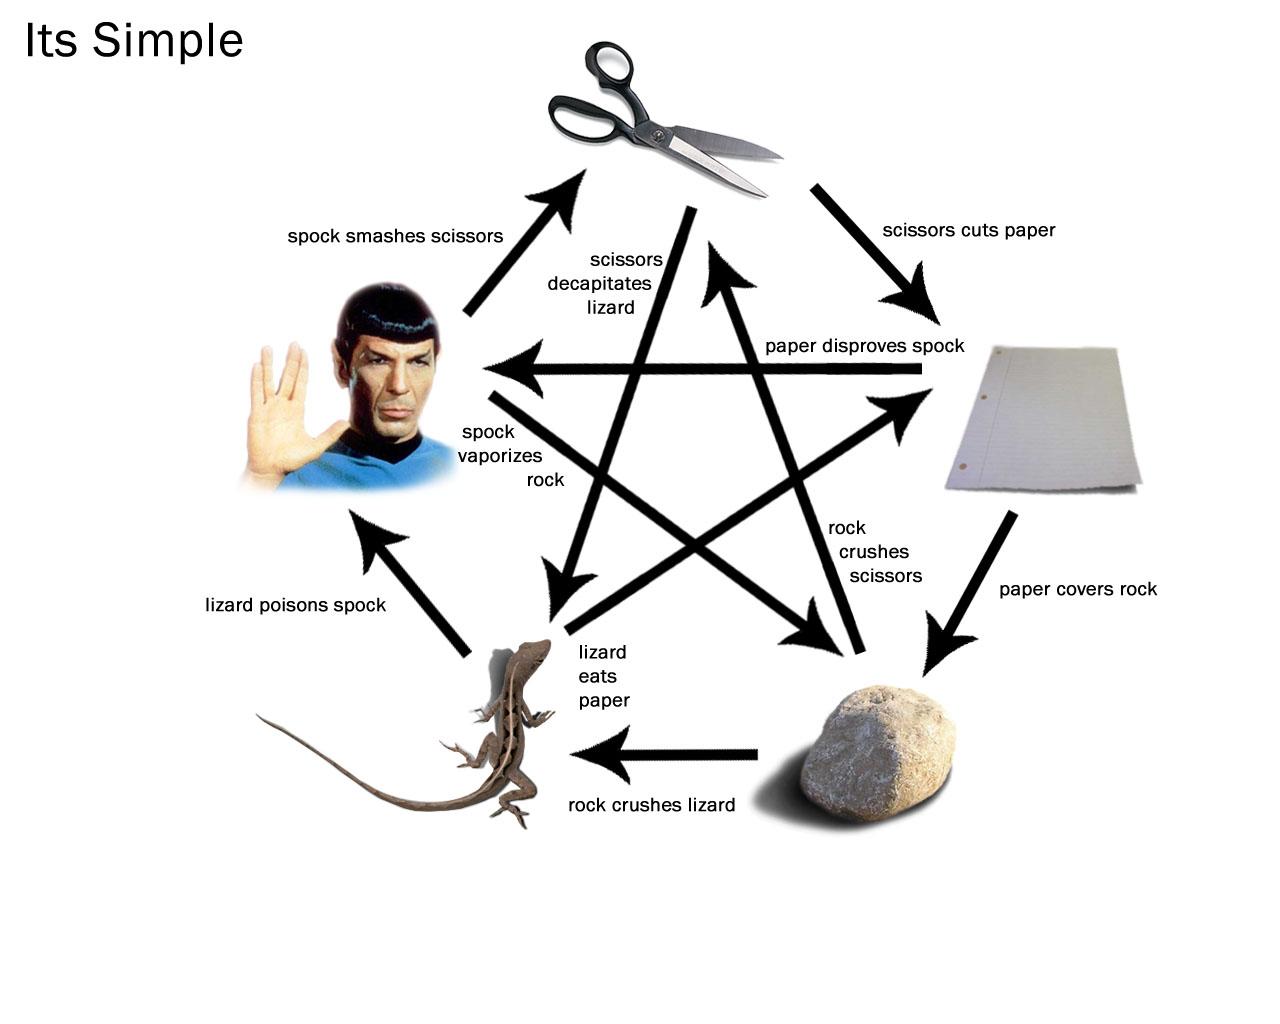 Piedra papel lagarto spock tijeras bing bang theory